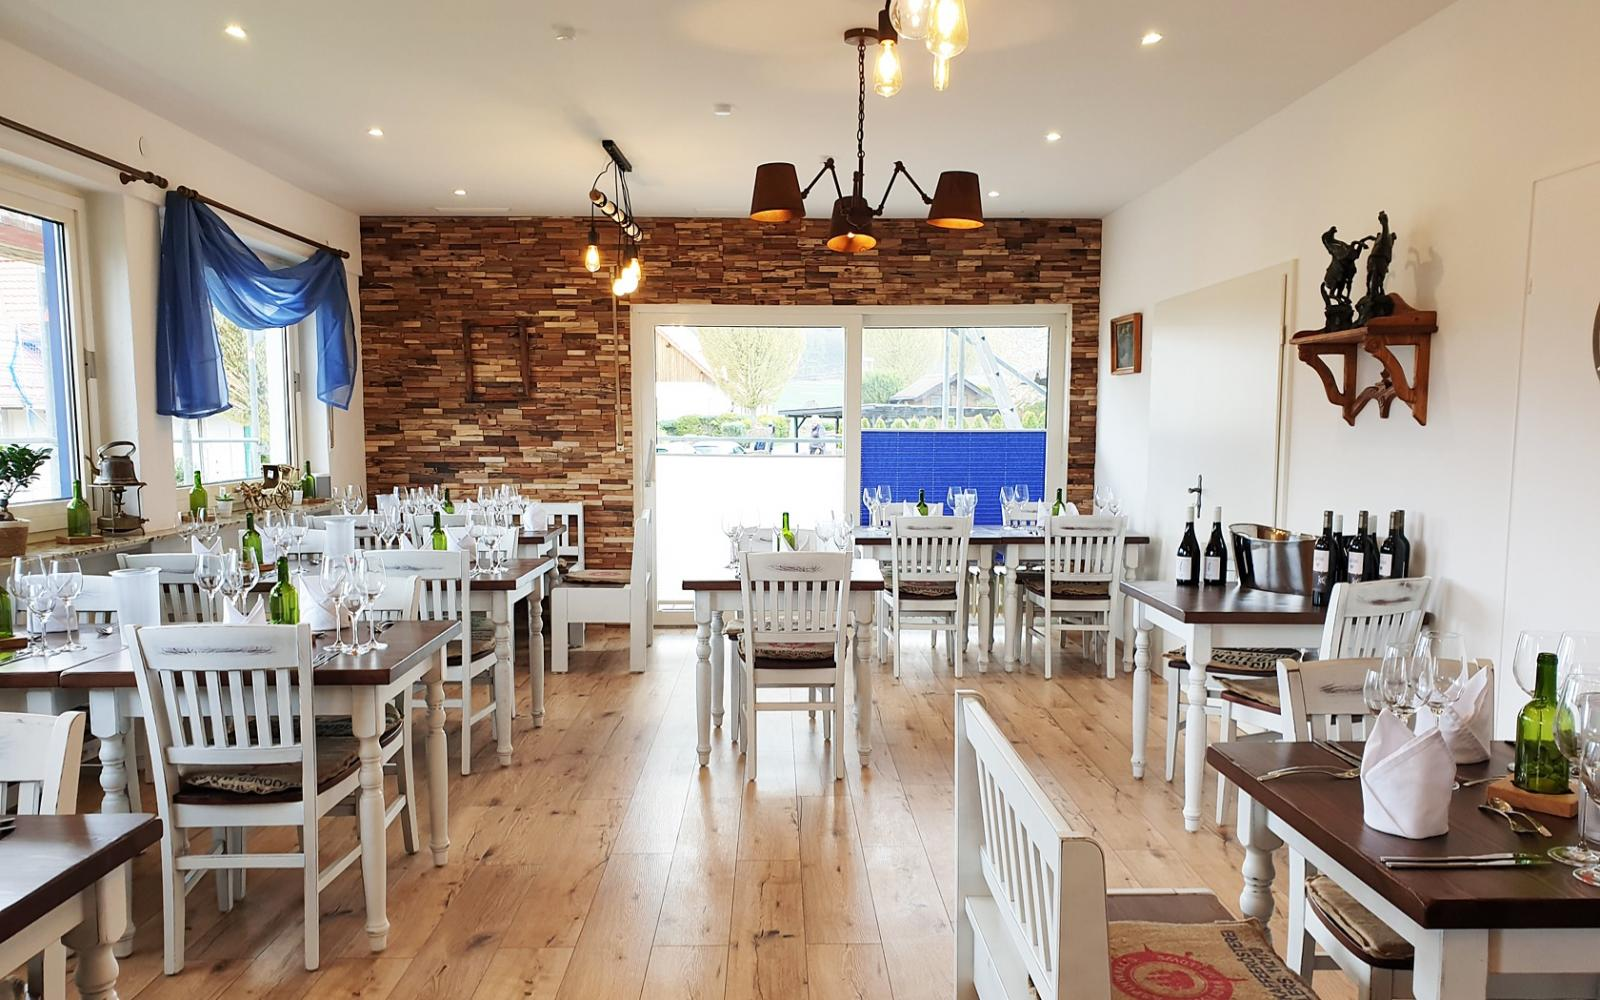 restauranttische-vintage-look-franca-pfa-restaurantstuehle-ben-vLunKTHhcFUp1y